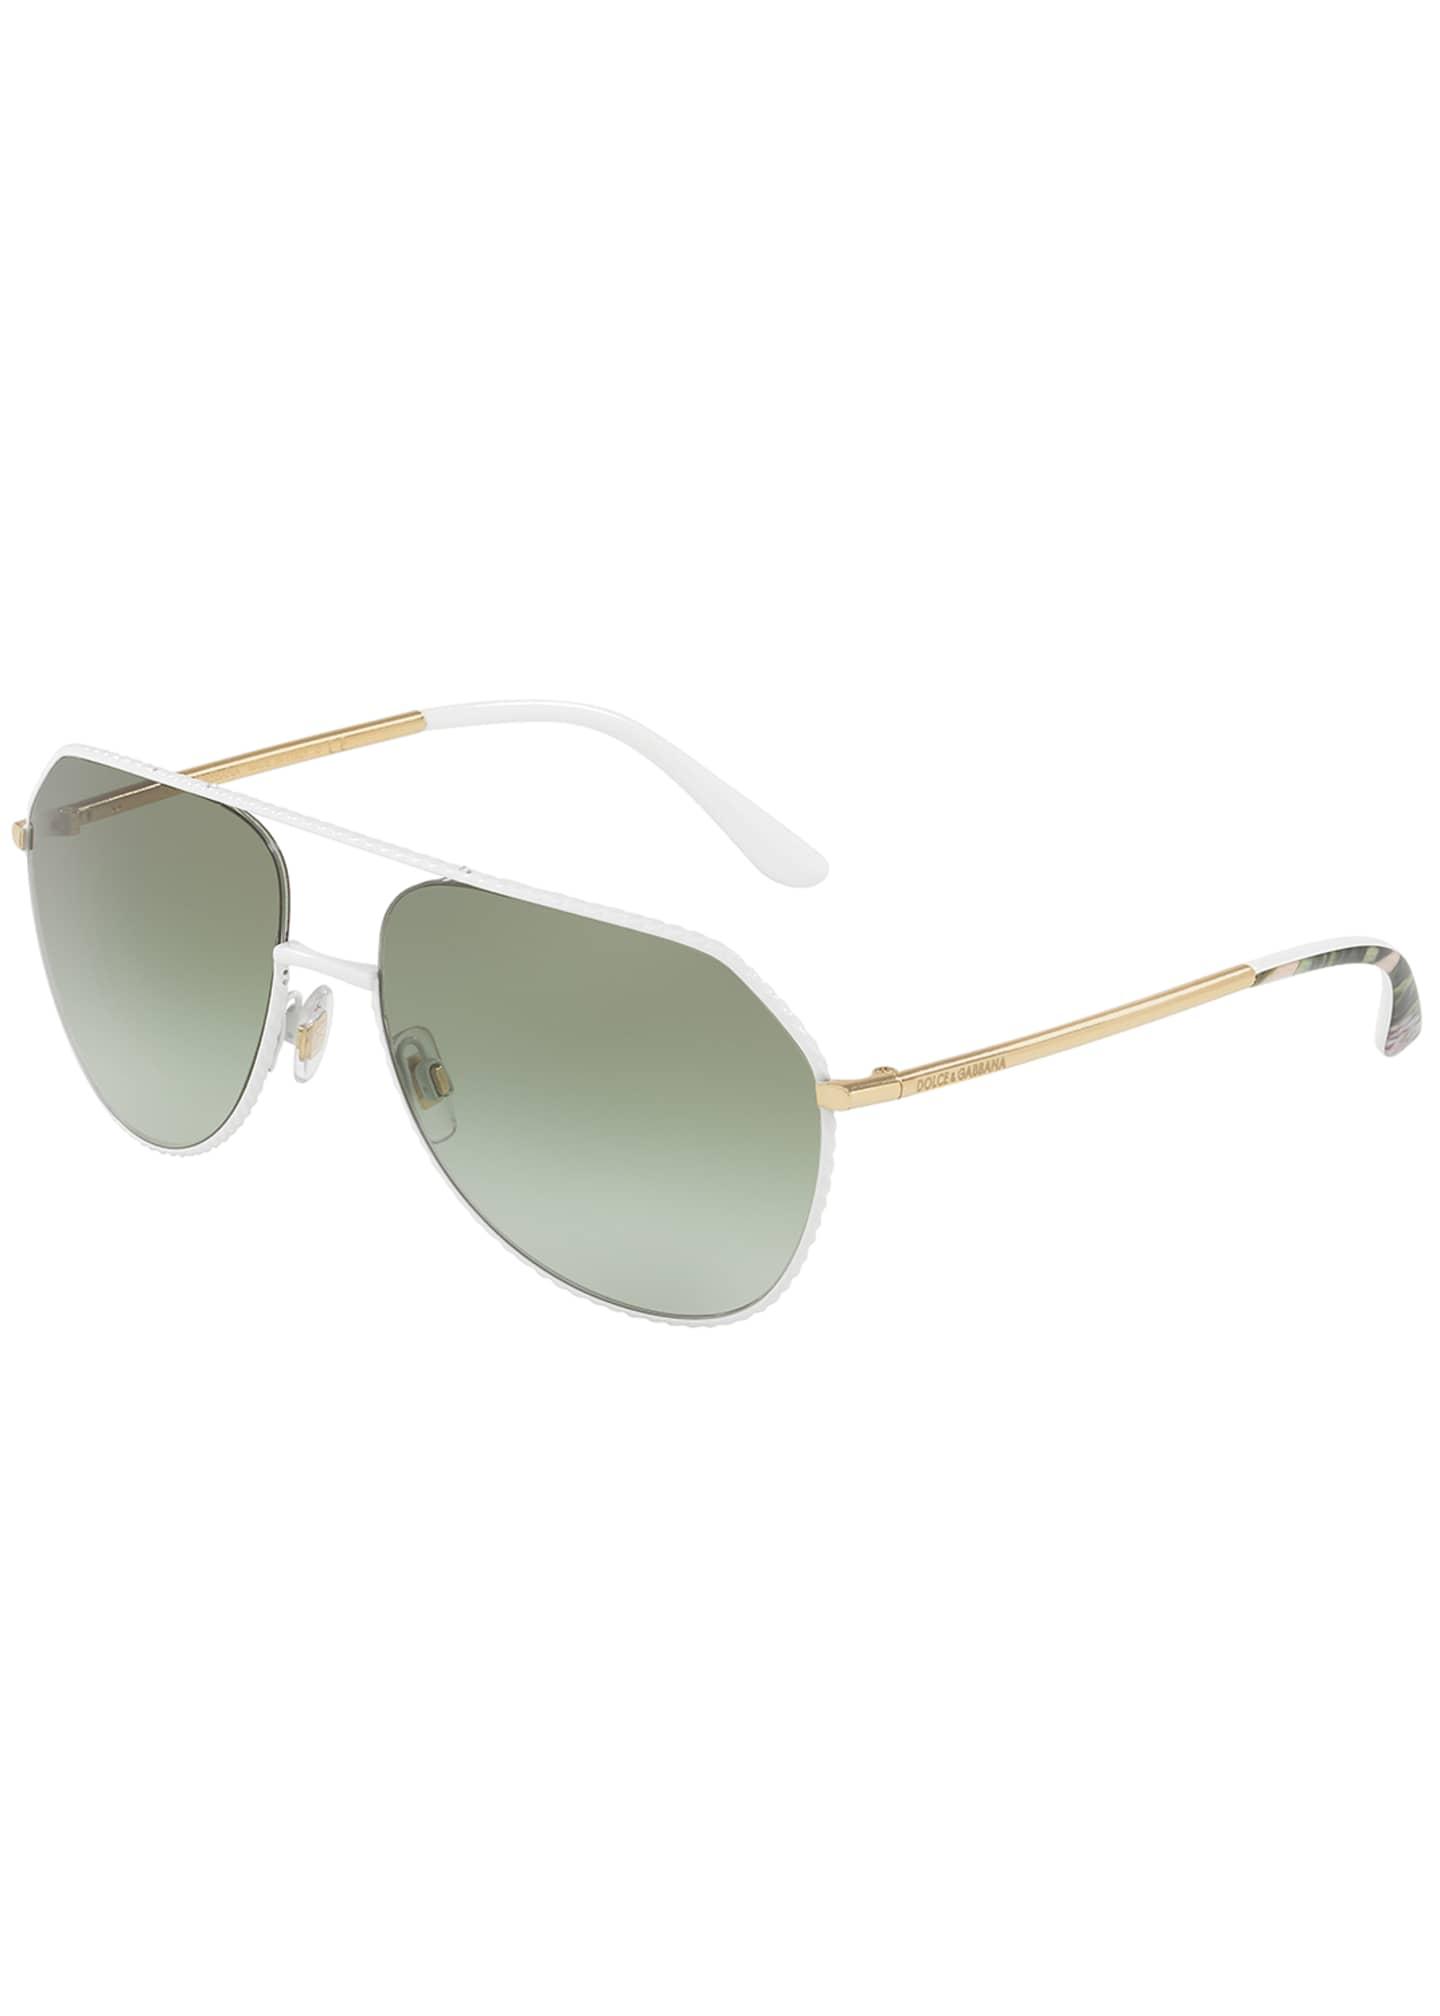 Dolce & Gabbana Braided Metal Aviator Sunglasses